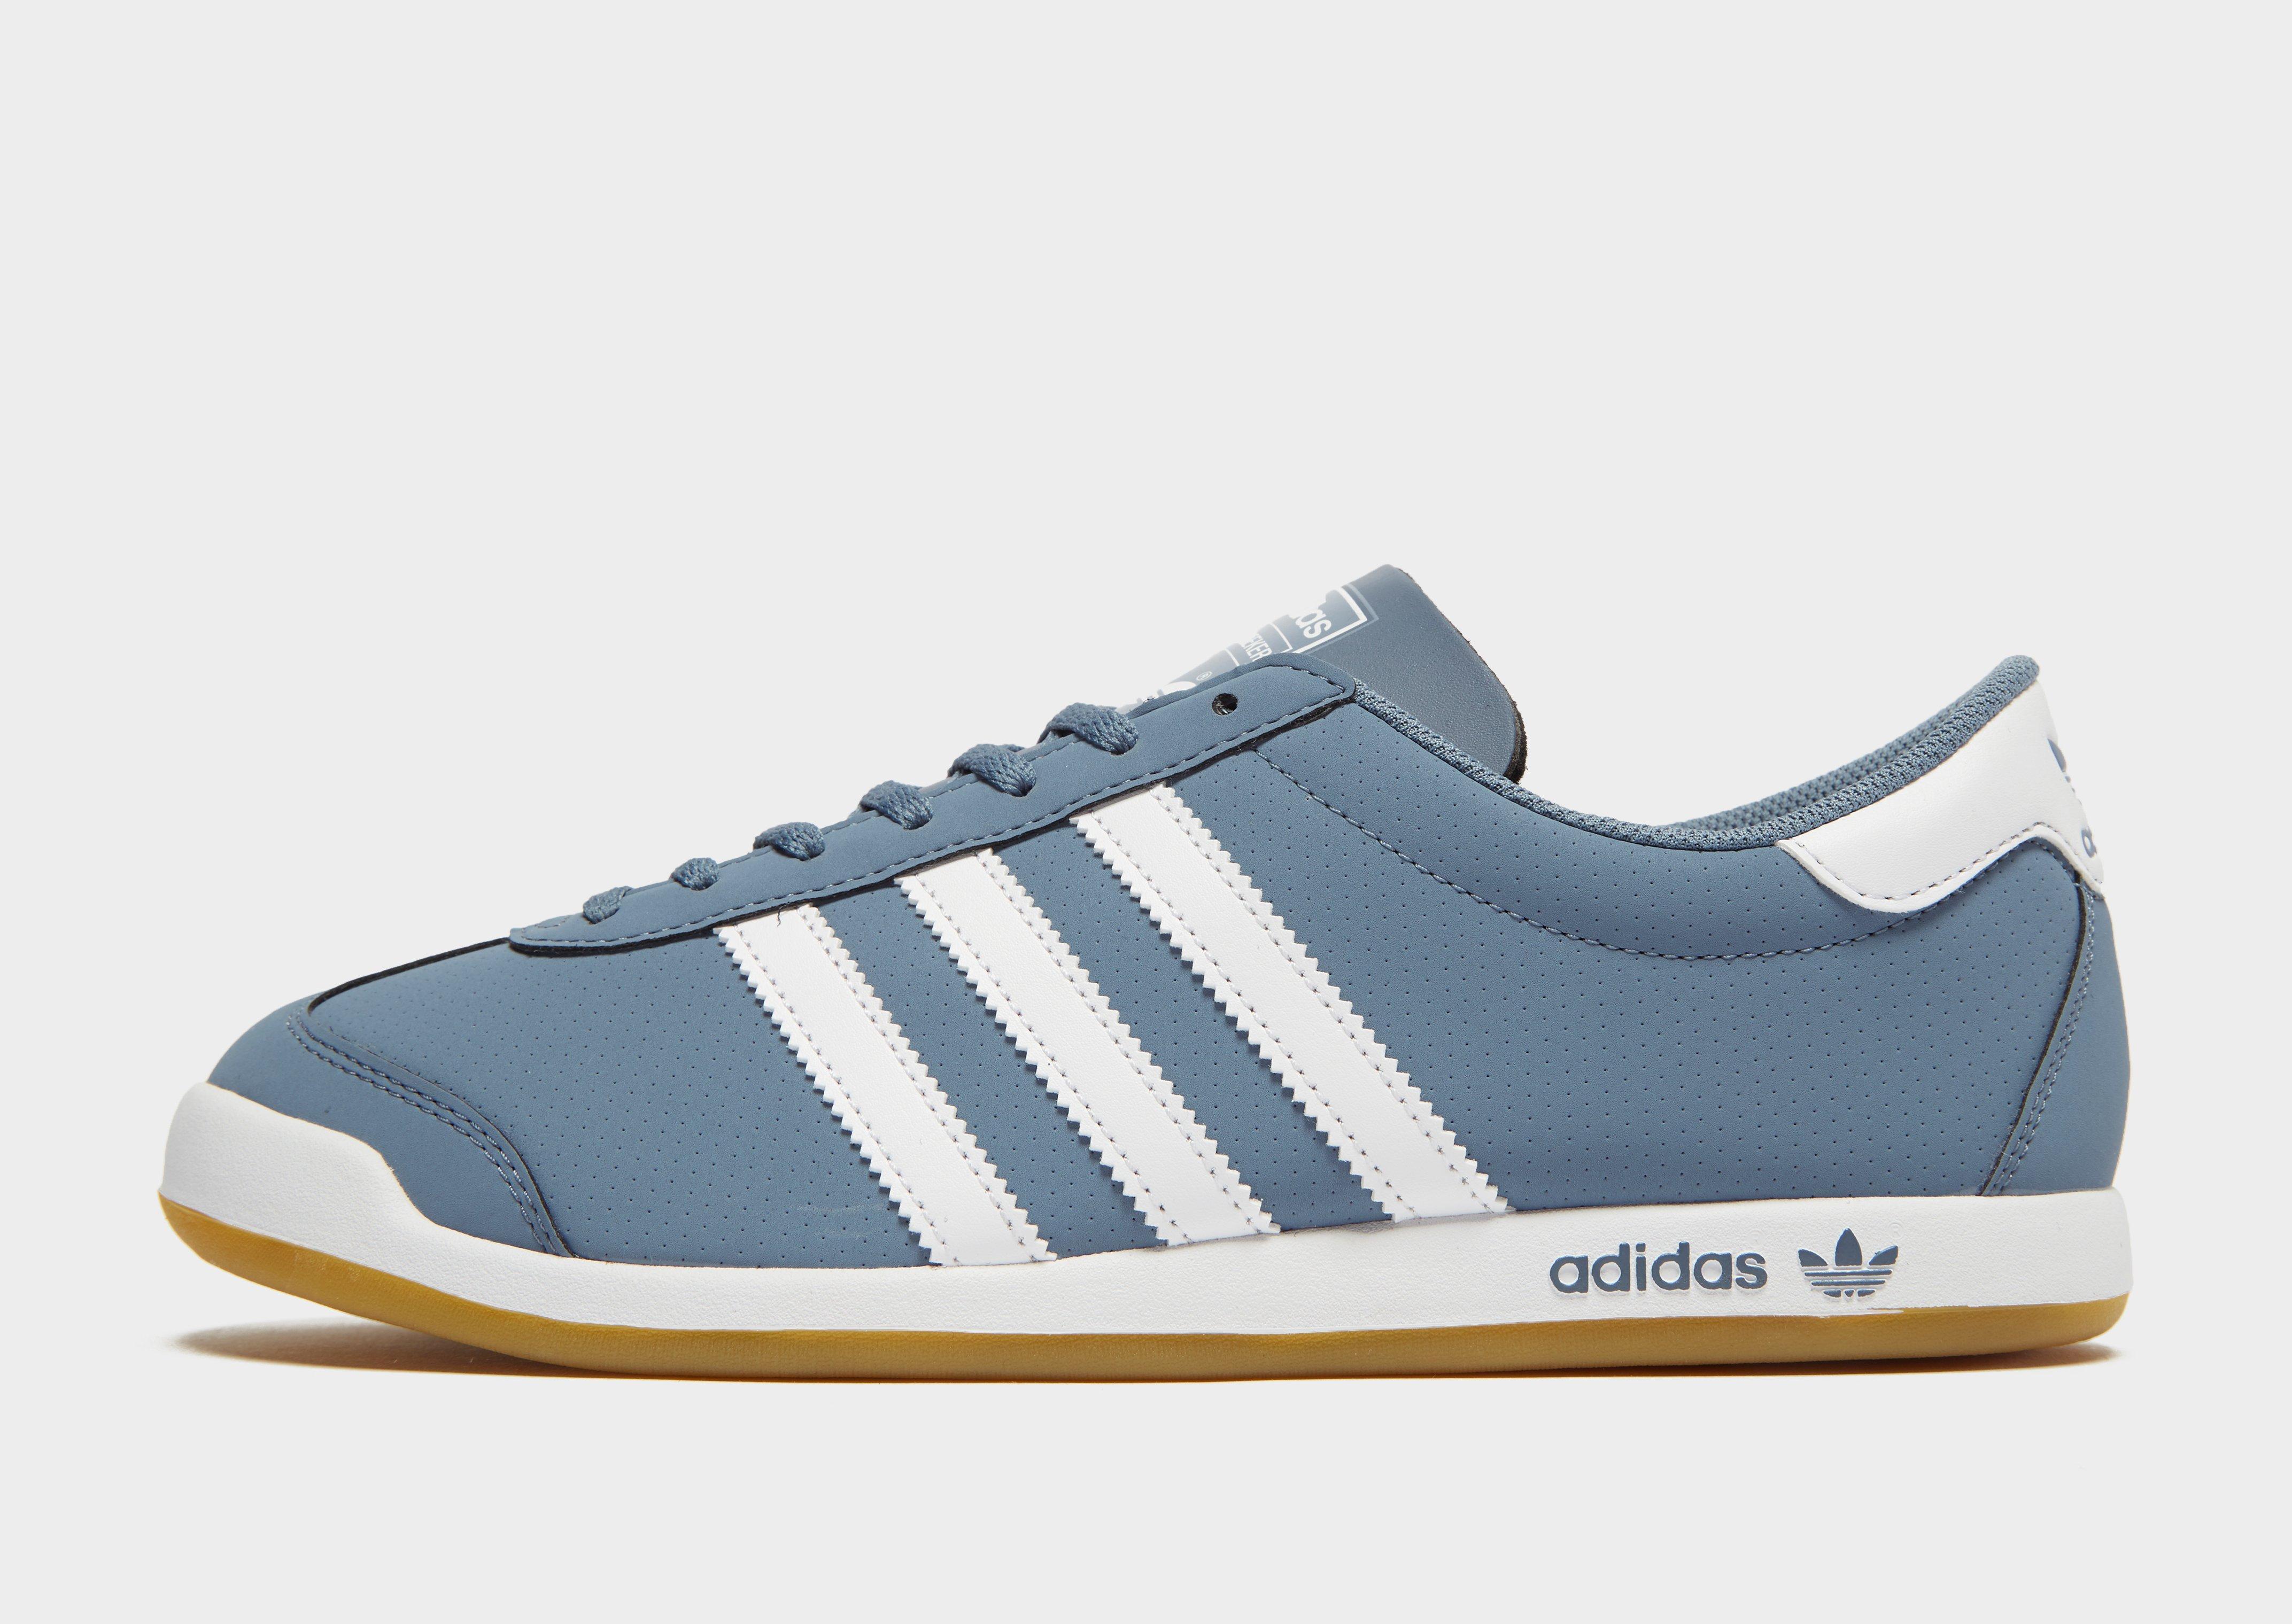 half off def55 baba3 adidas classic shoes adidas Originals ...